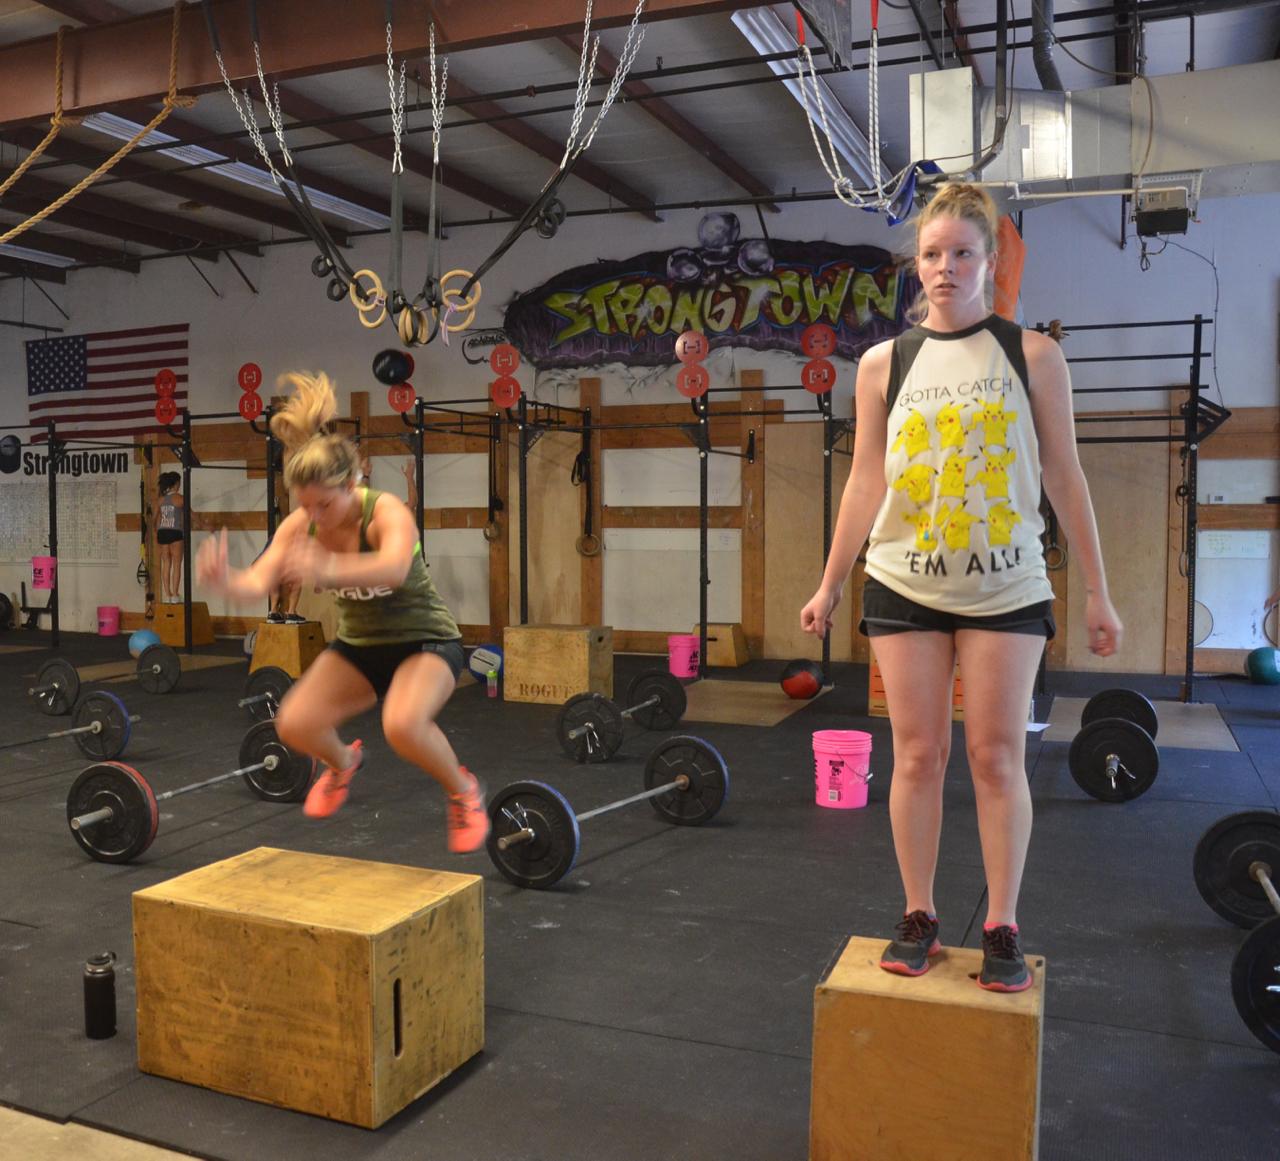 The Maeve & Steph during their box jump / step-ups.